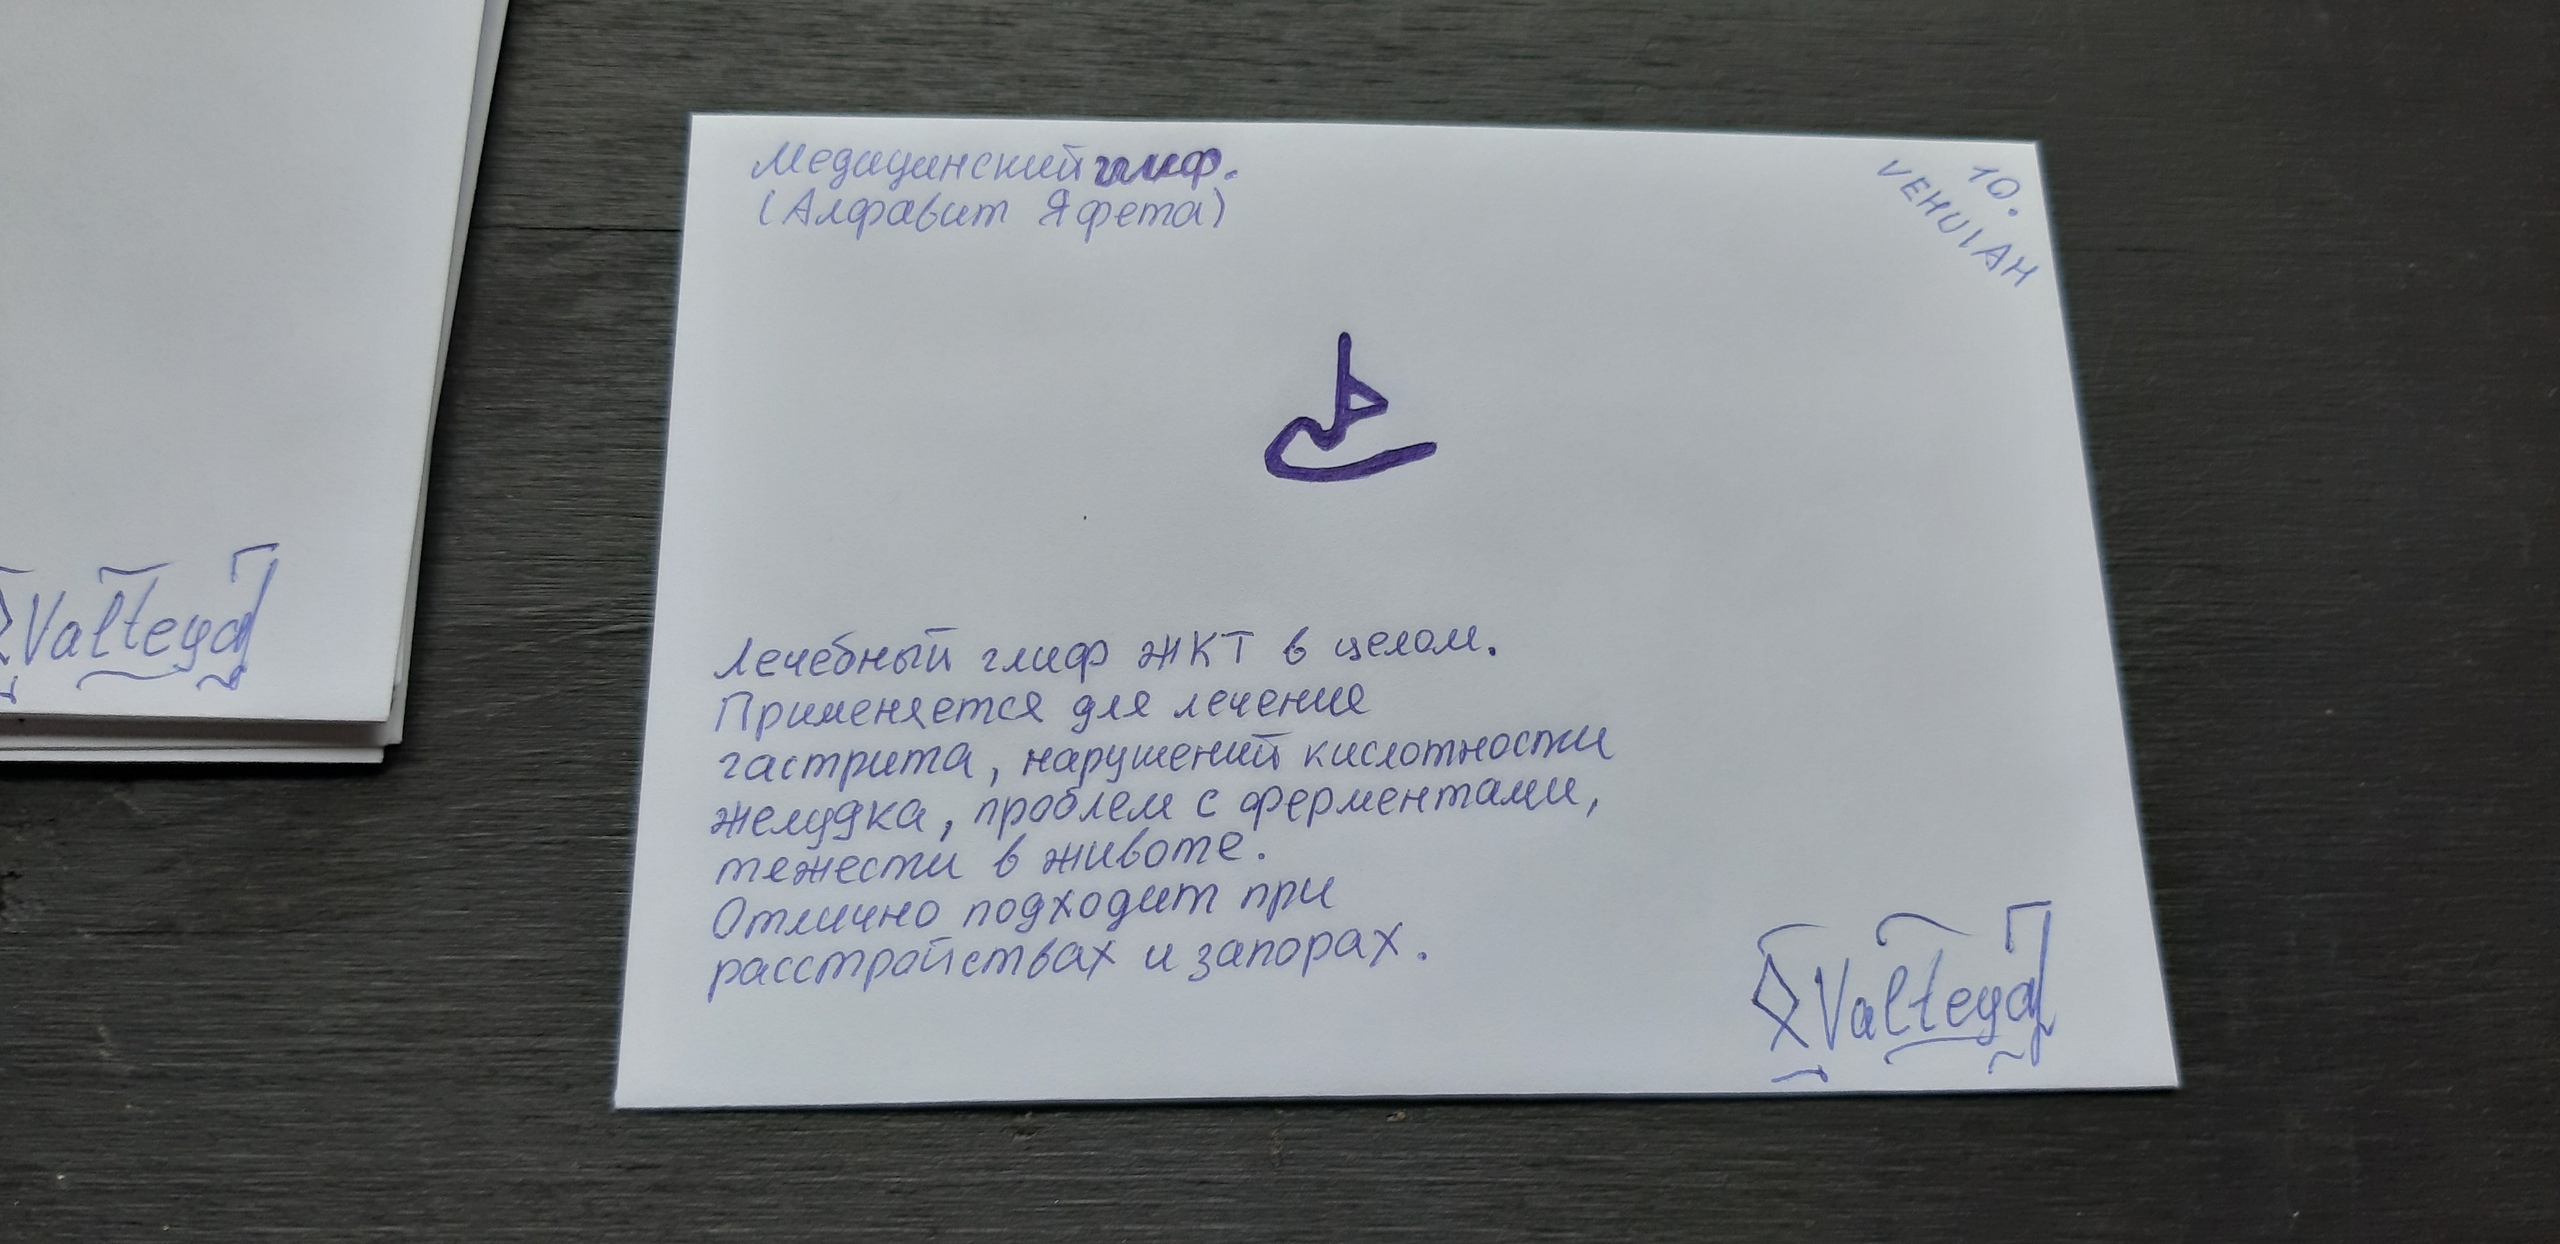 Конверты медицинские глифы. Алфавит Яфета RssCErkGlD8